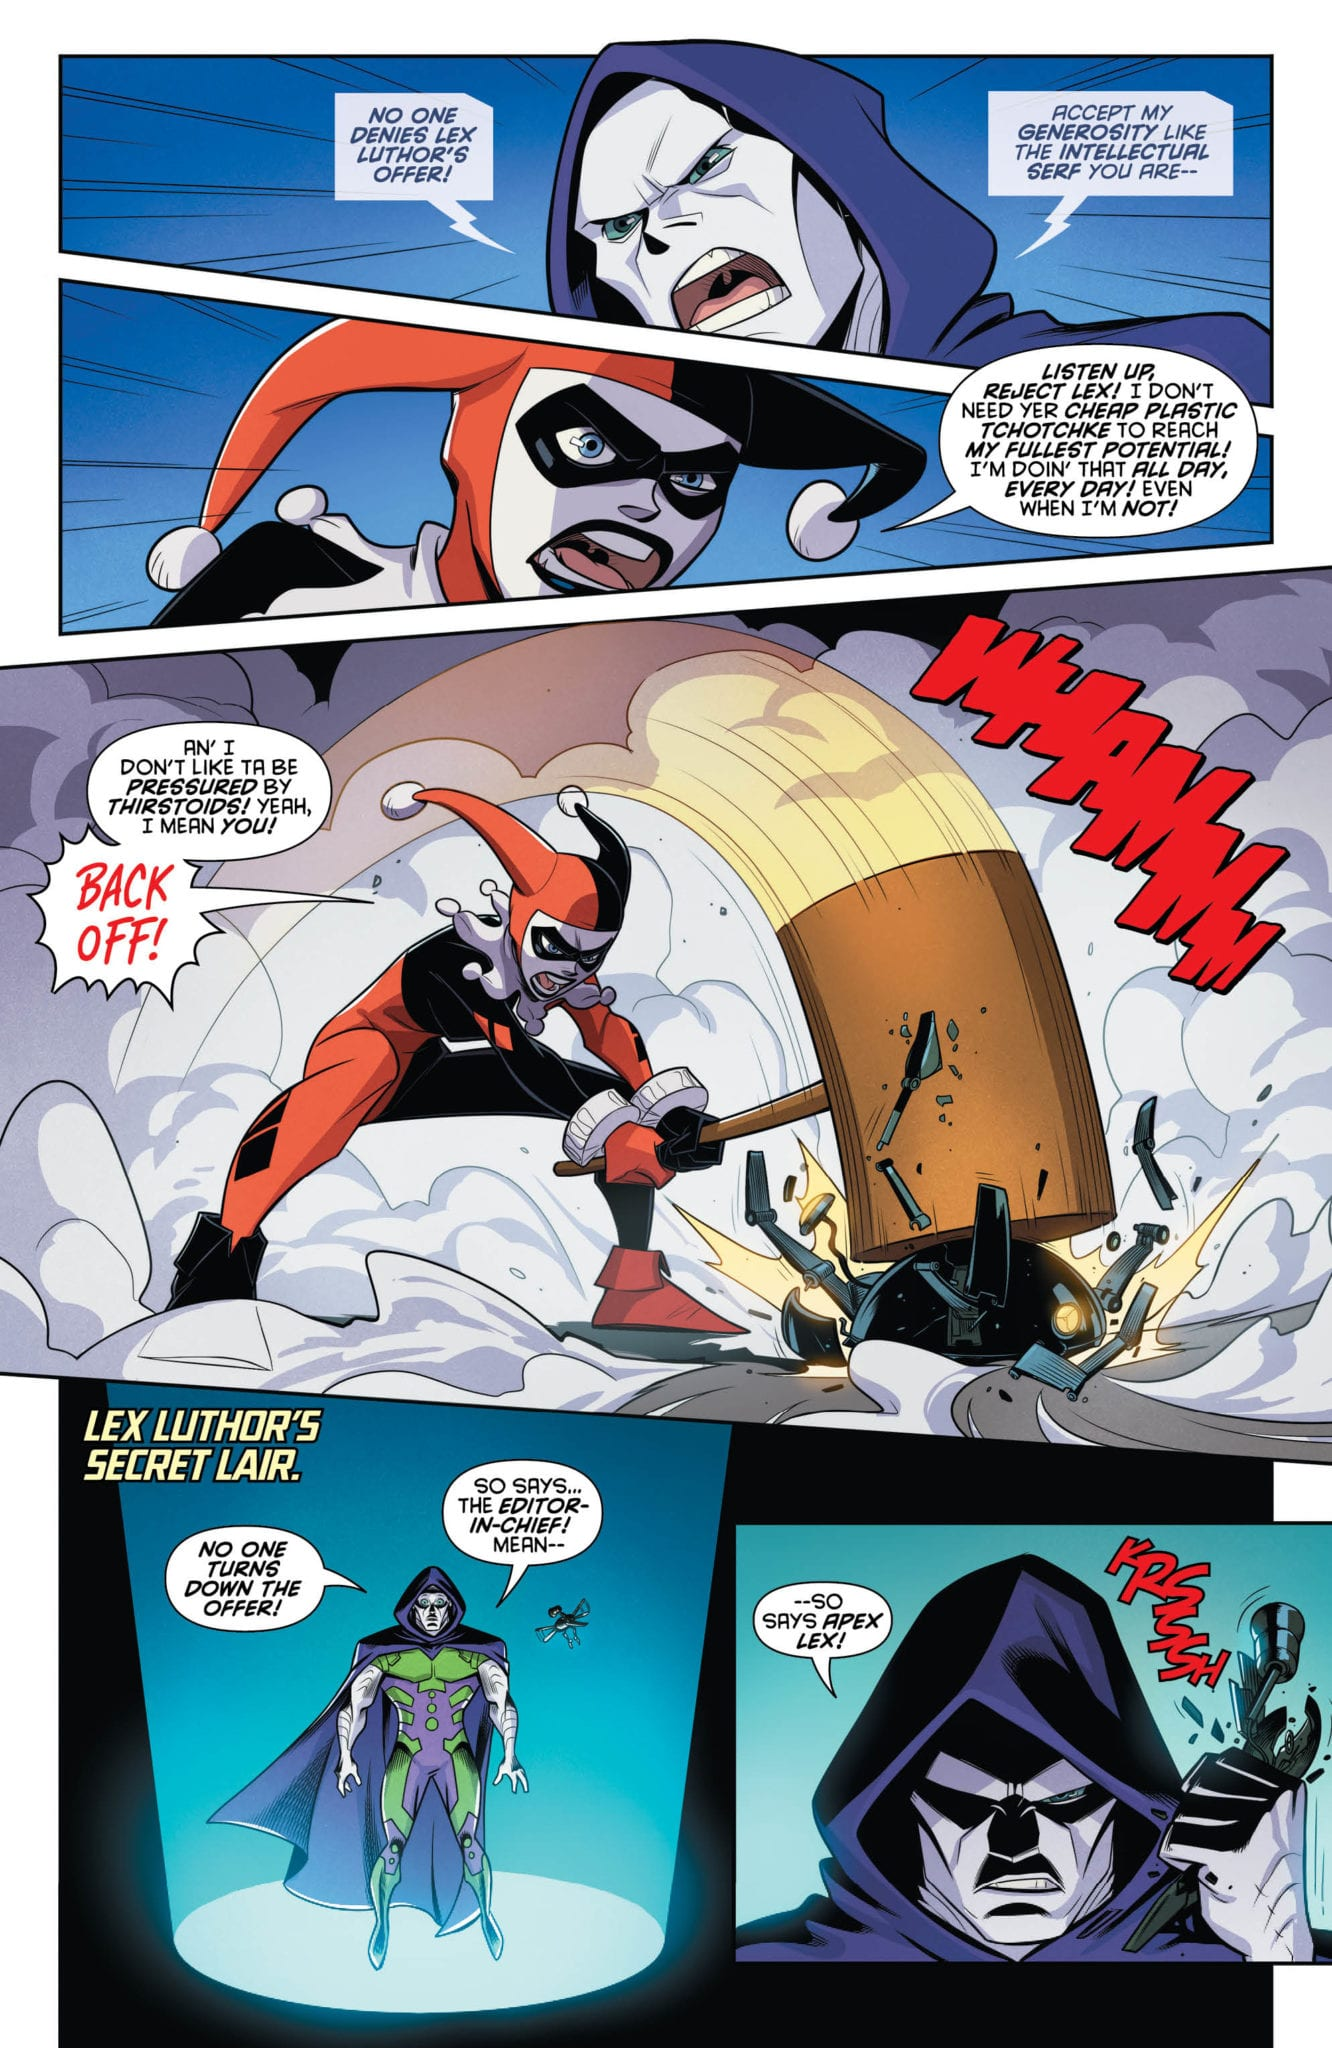 DC Comics Exclusive Preview: HARLEY QUINN #64 - Enter Apex Lex! 5